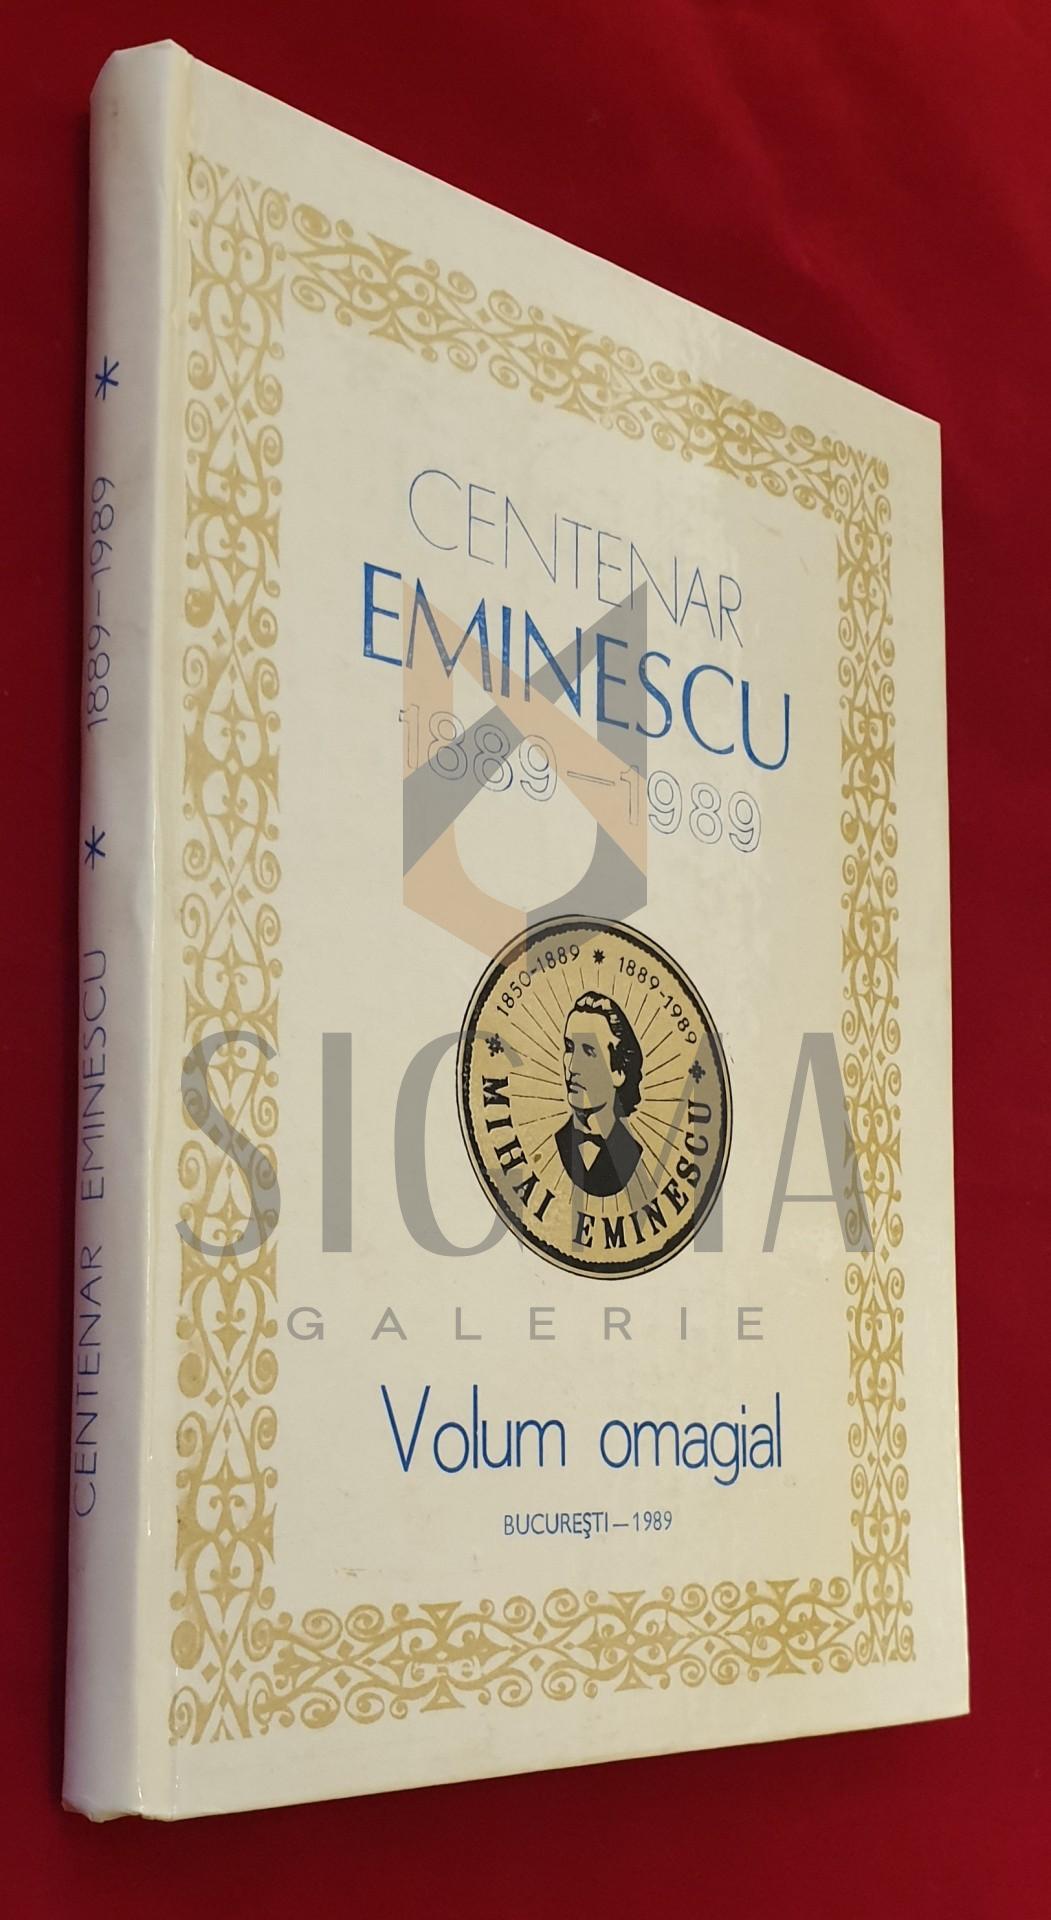 Centenar Eminescu 1889-1989  *  Volum omagiar